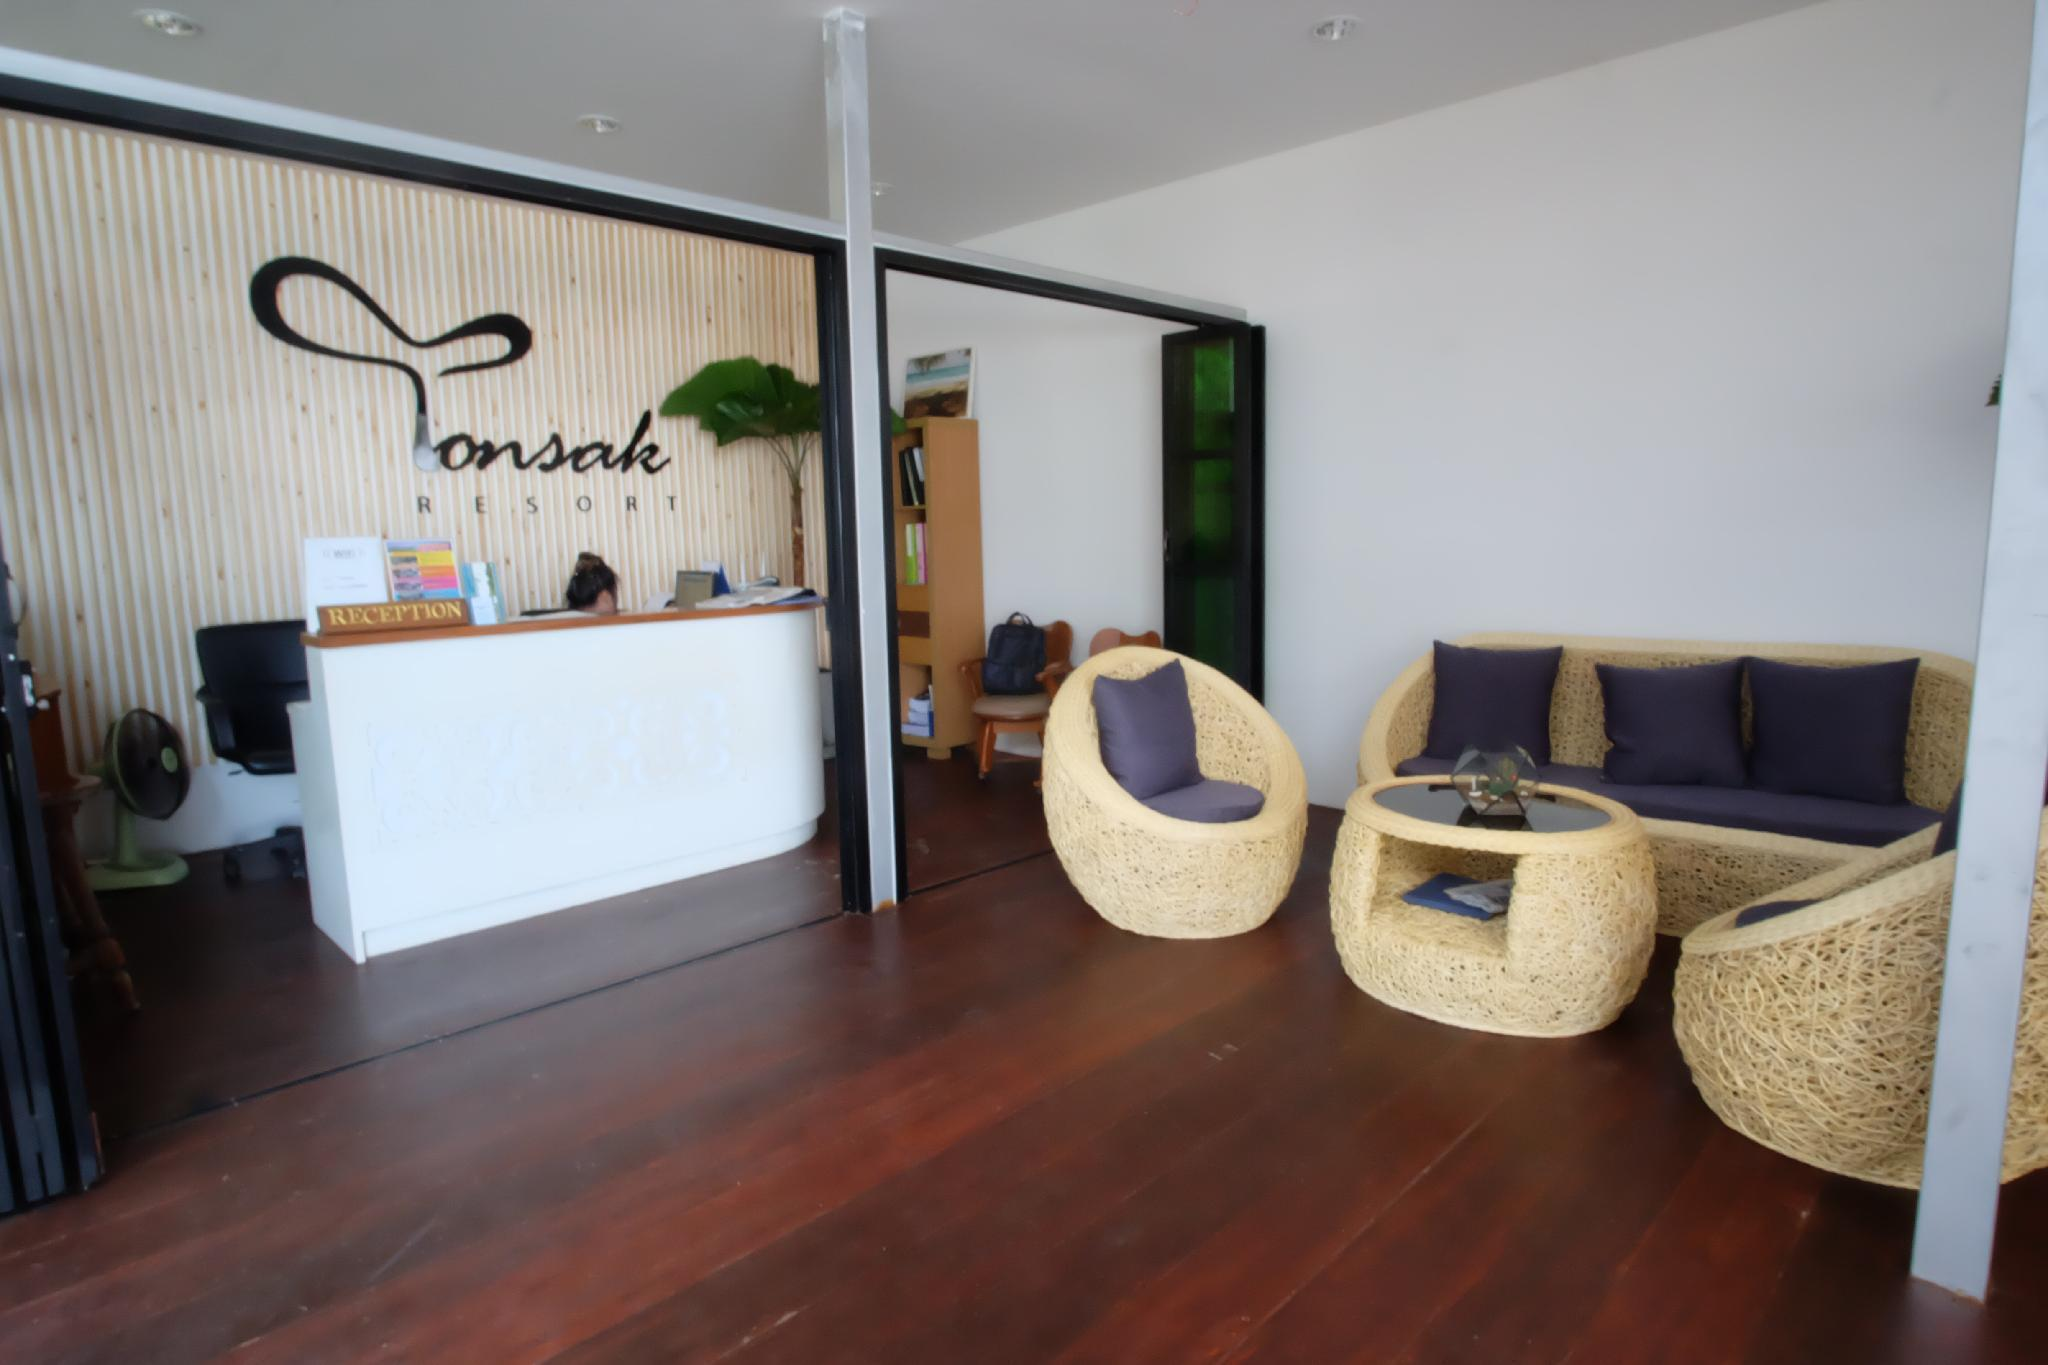 Tonsak Resort ต้นสัก รีสอร์ท